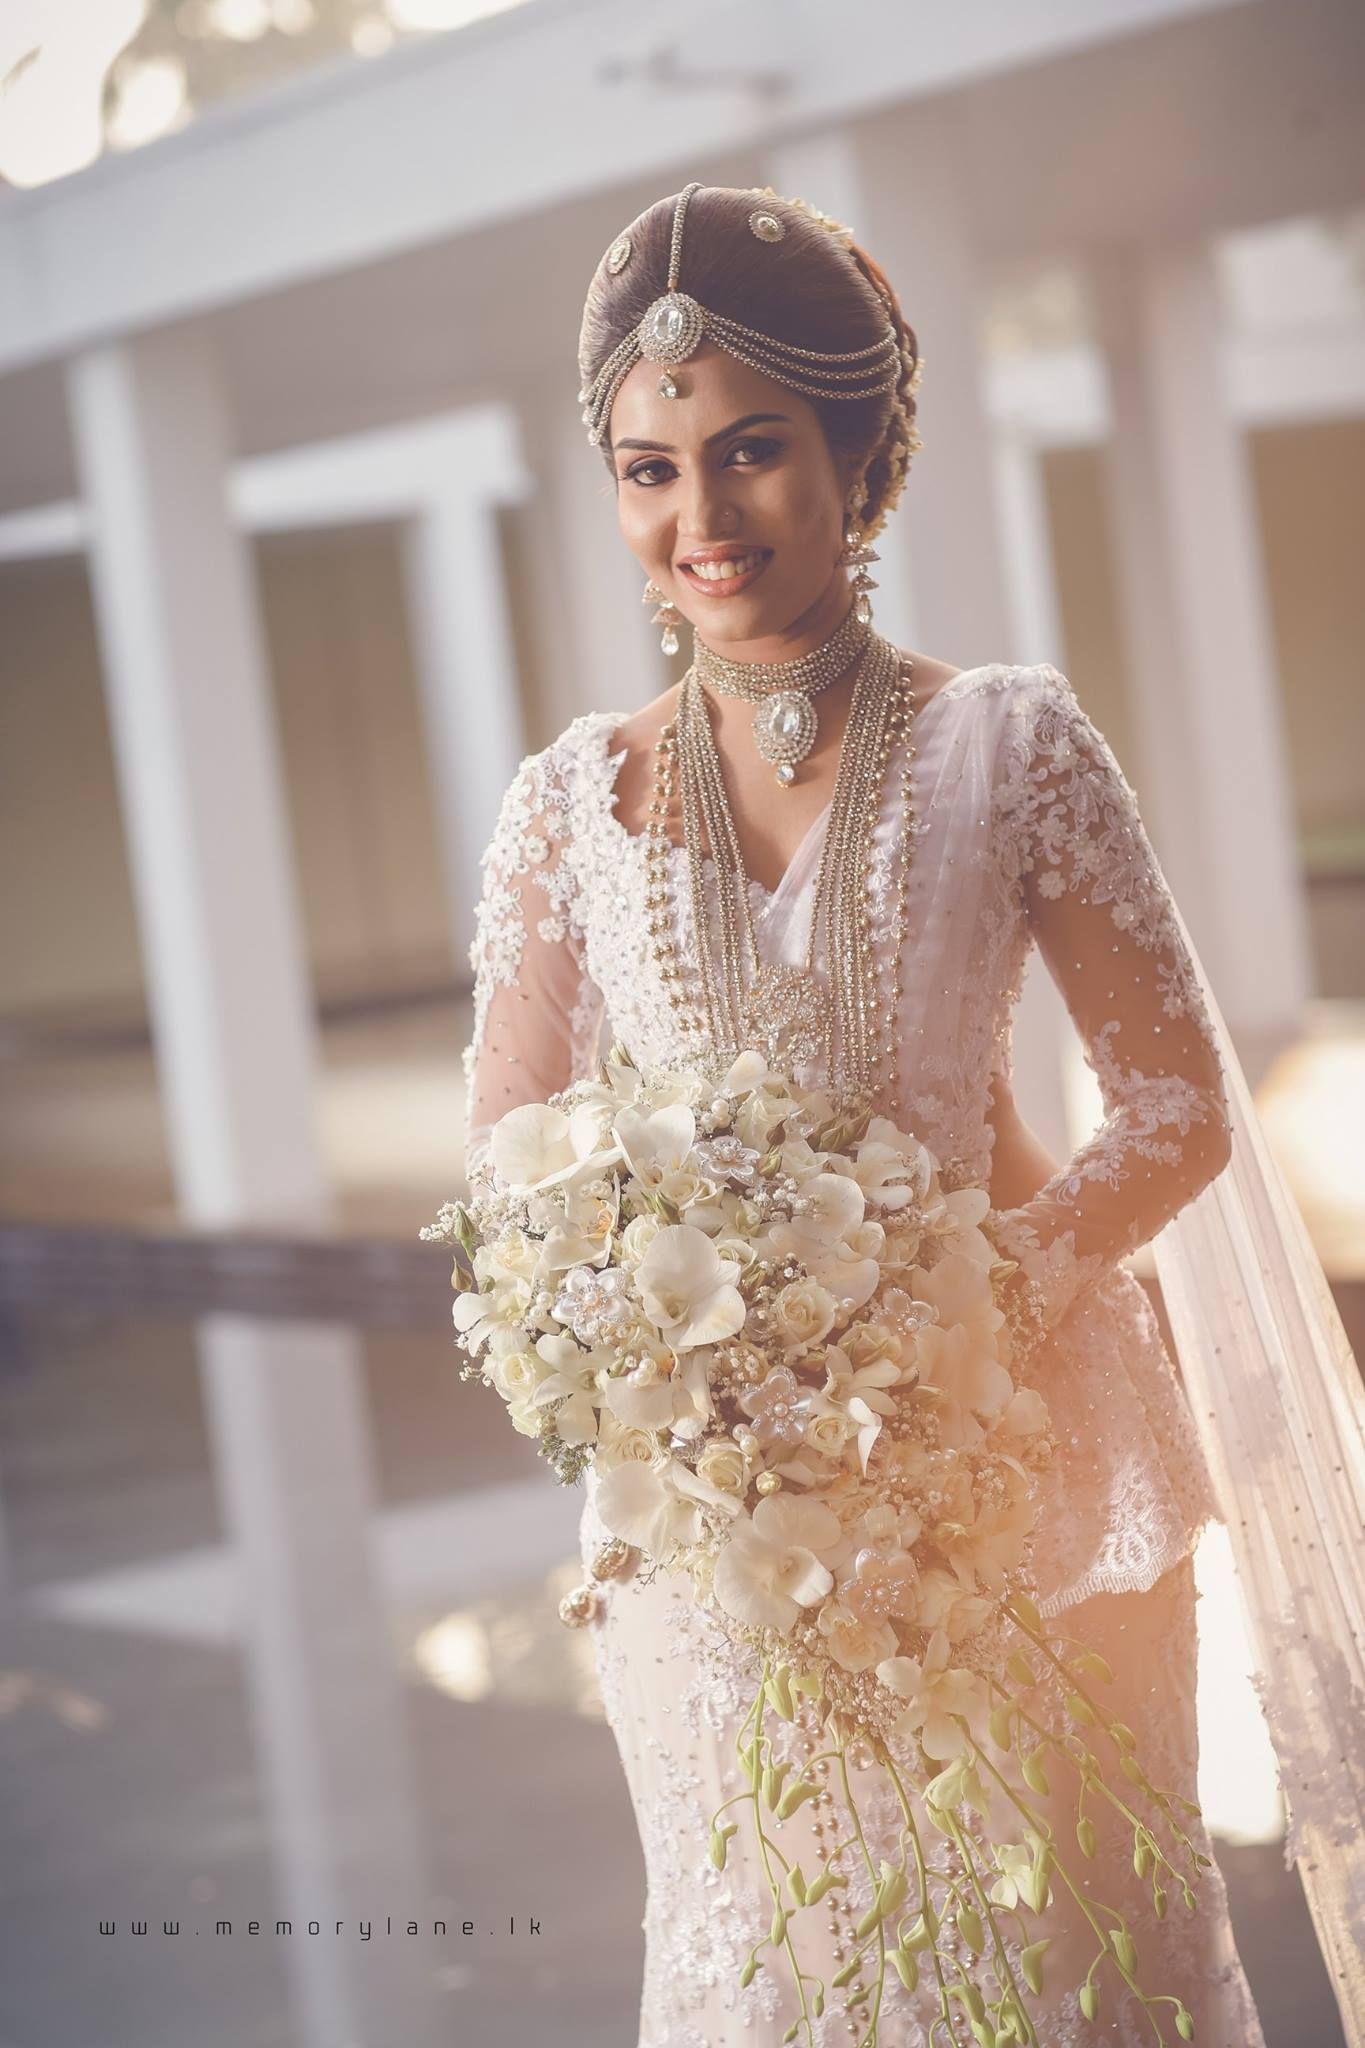 Sri Lankan Bride Christian Bridal Saree White Saree Wedding Bridal Wedding Dresses